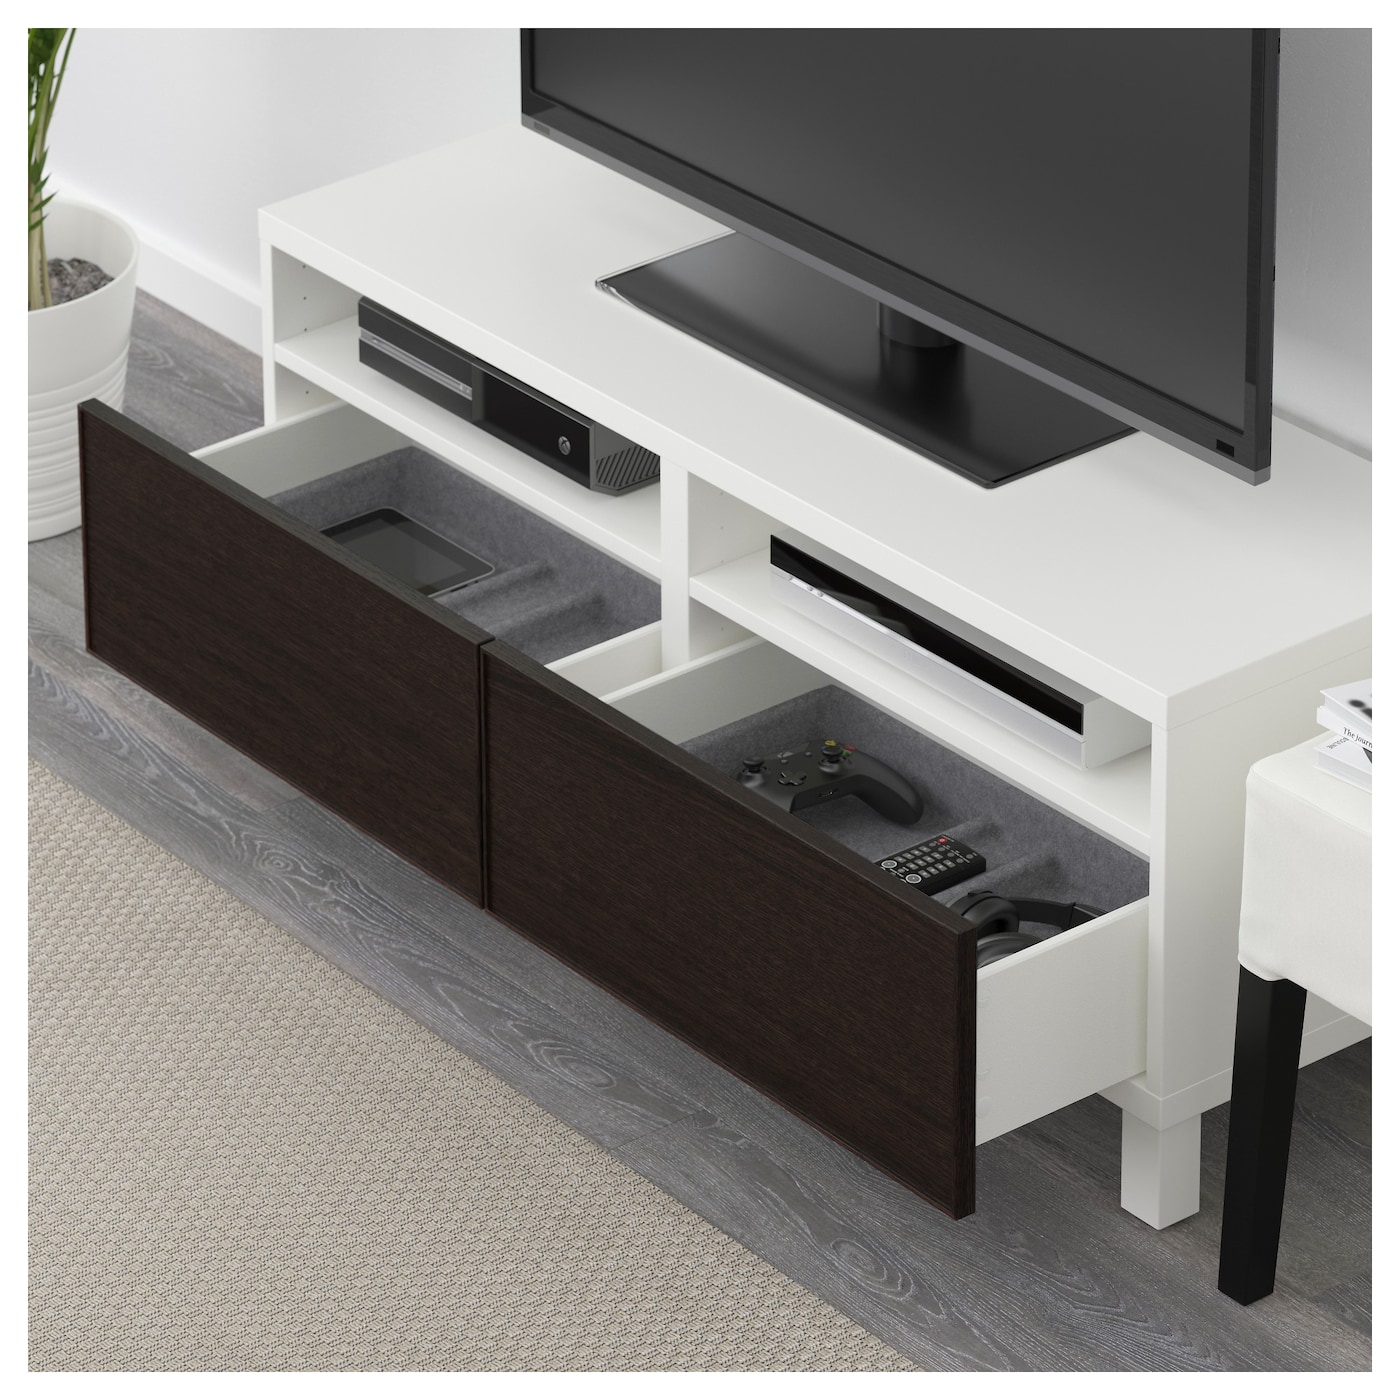 best banc tv avec tiroirs blanc inviken brun noir 120x40x48 cm ikea. Black Bedroom Furniture Sets. Home Design Ideas